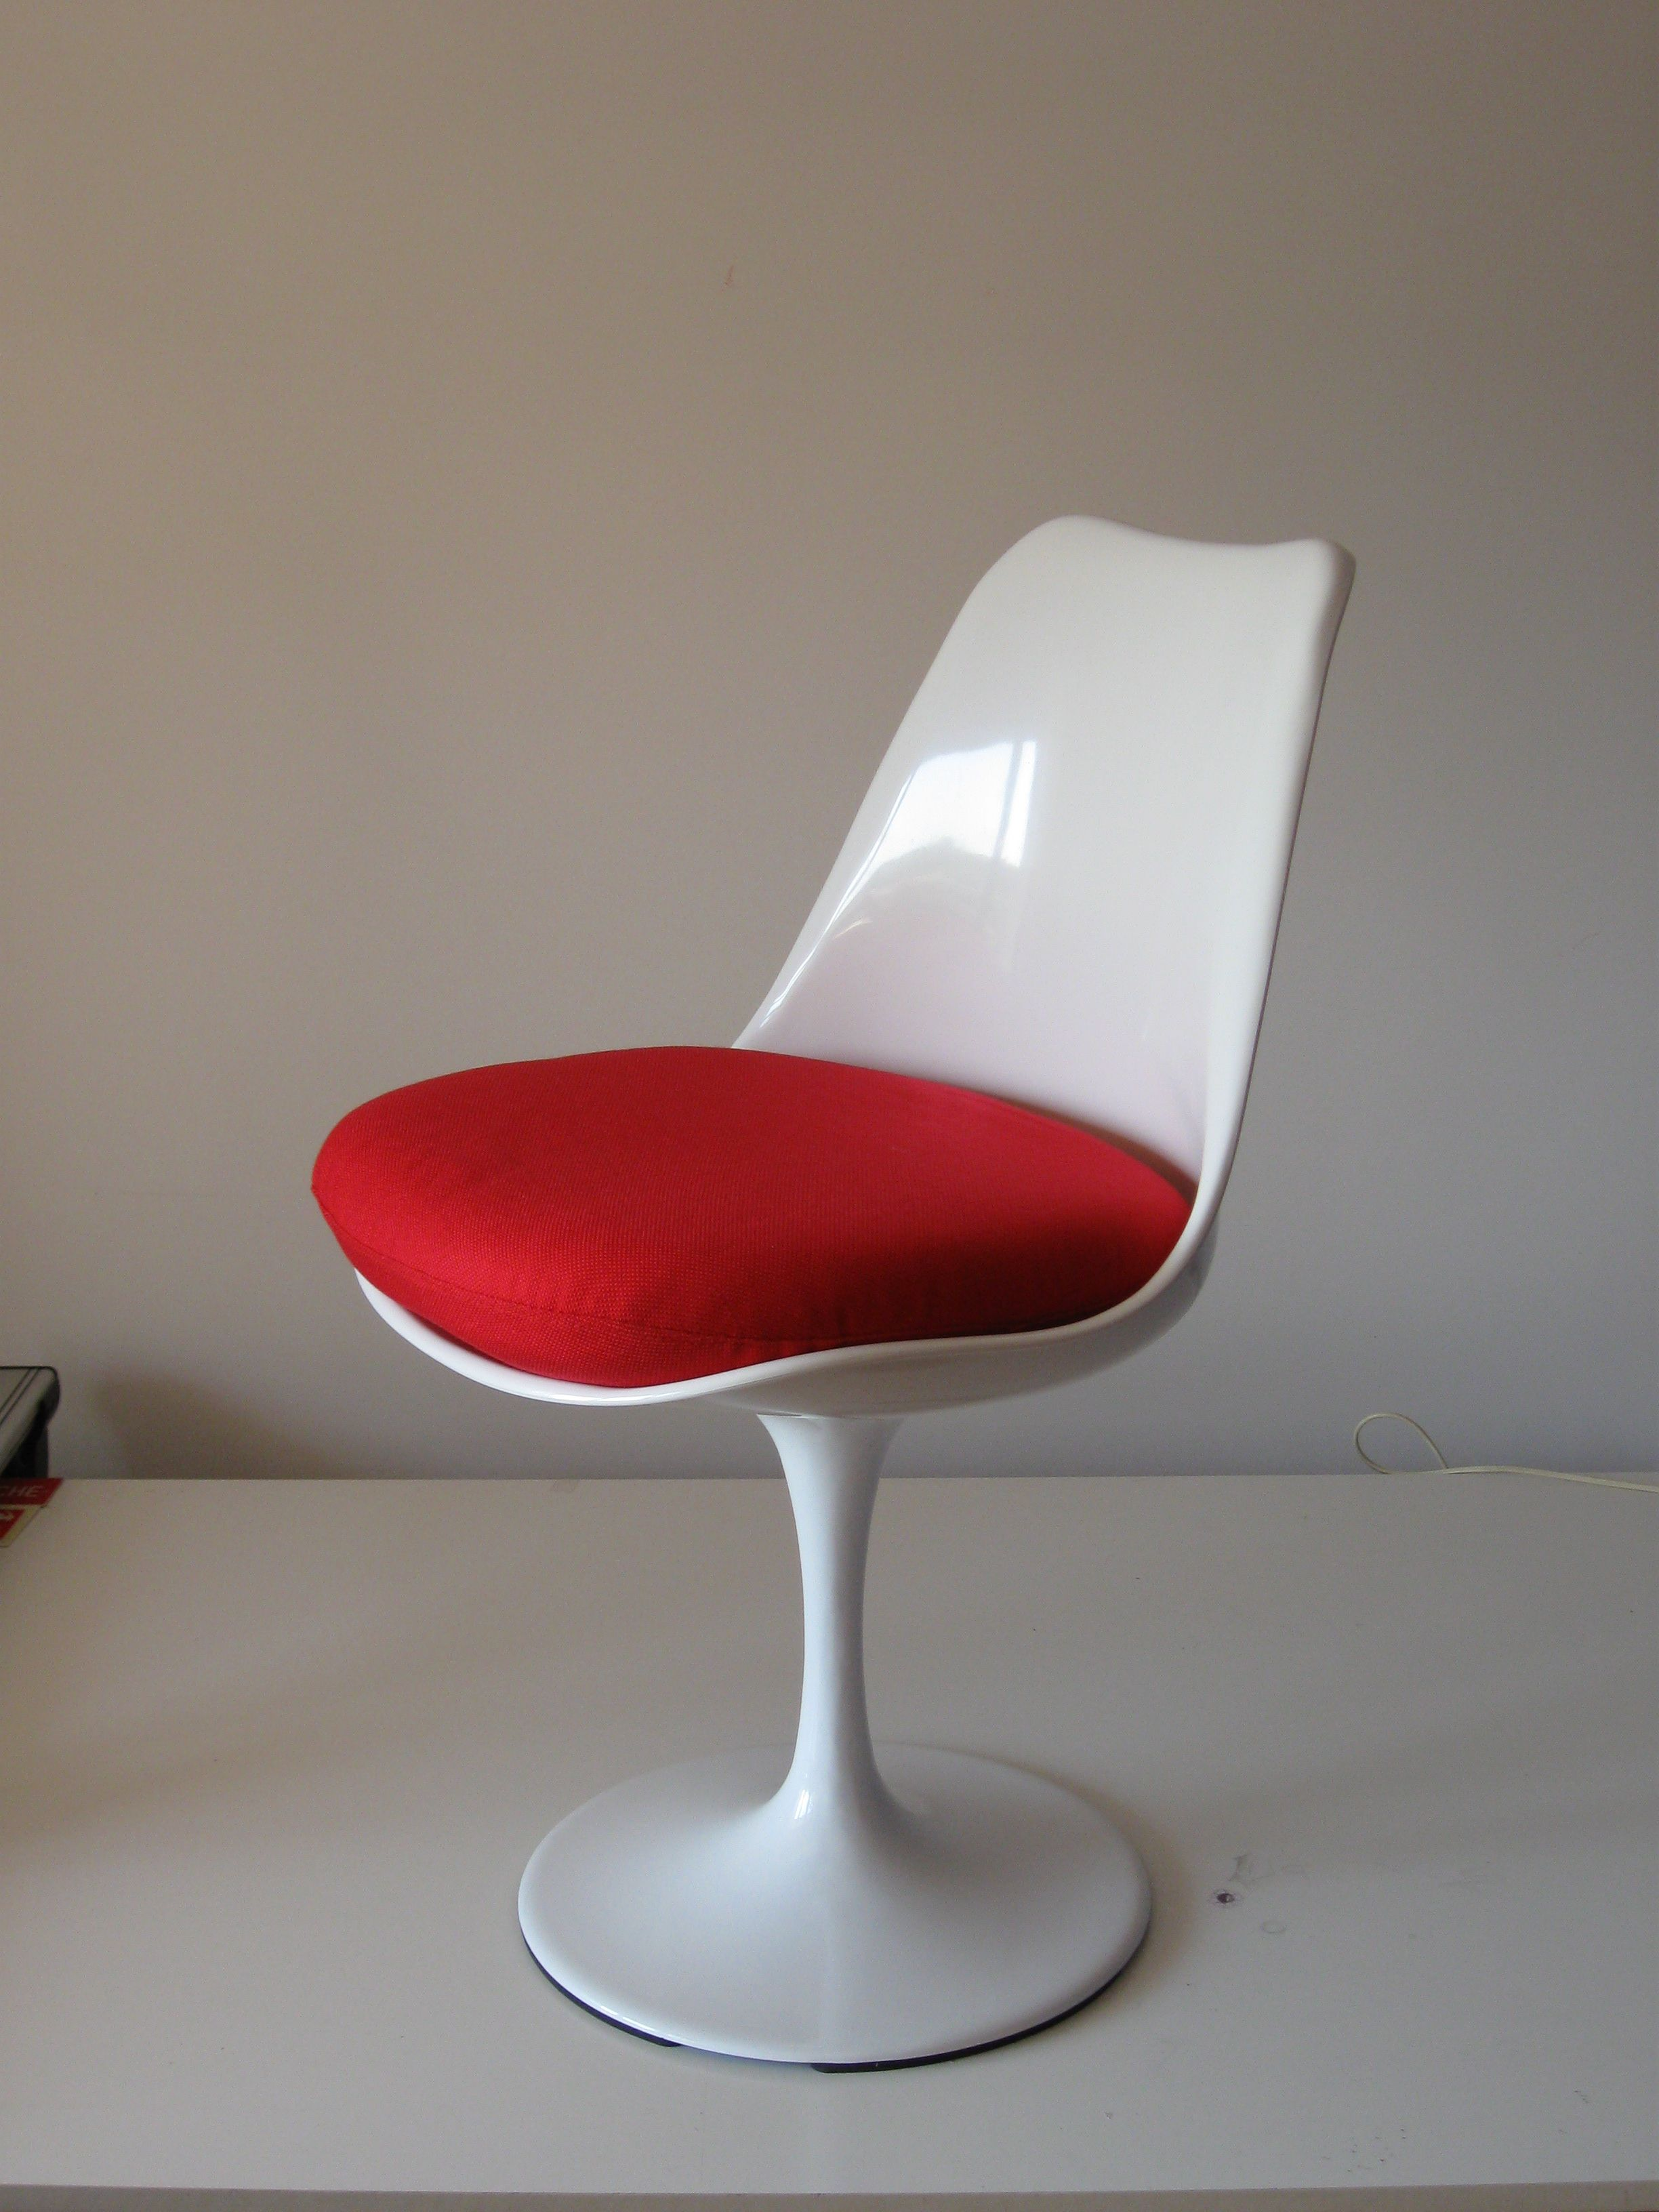 Sedia Tulip, Eero Saarinen, 1956. Riedizione contemporanea ...